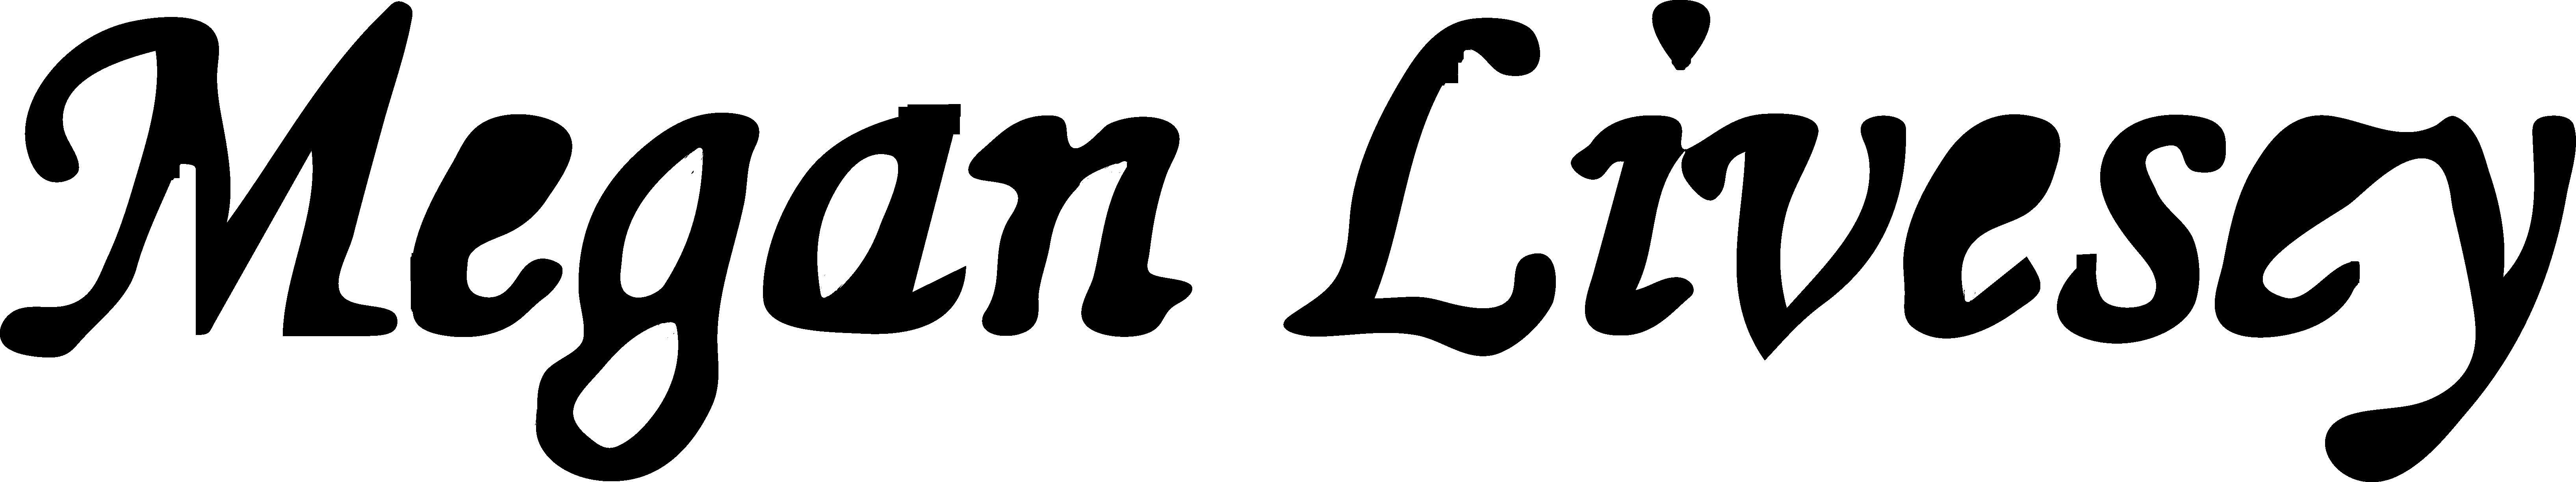 MEGAN LIVESEY Signature